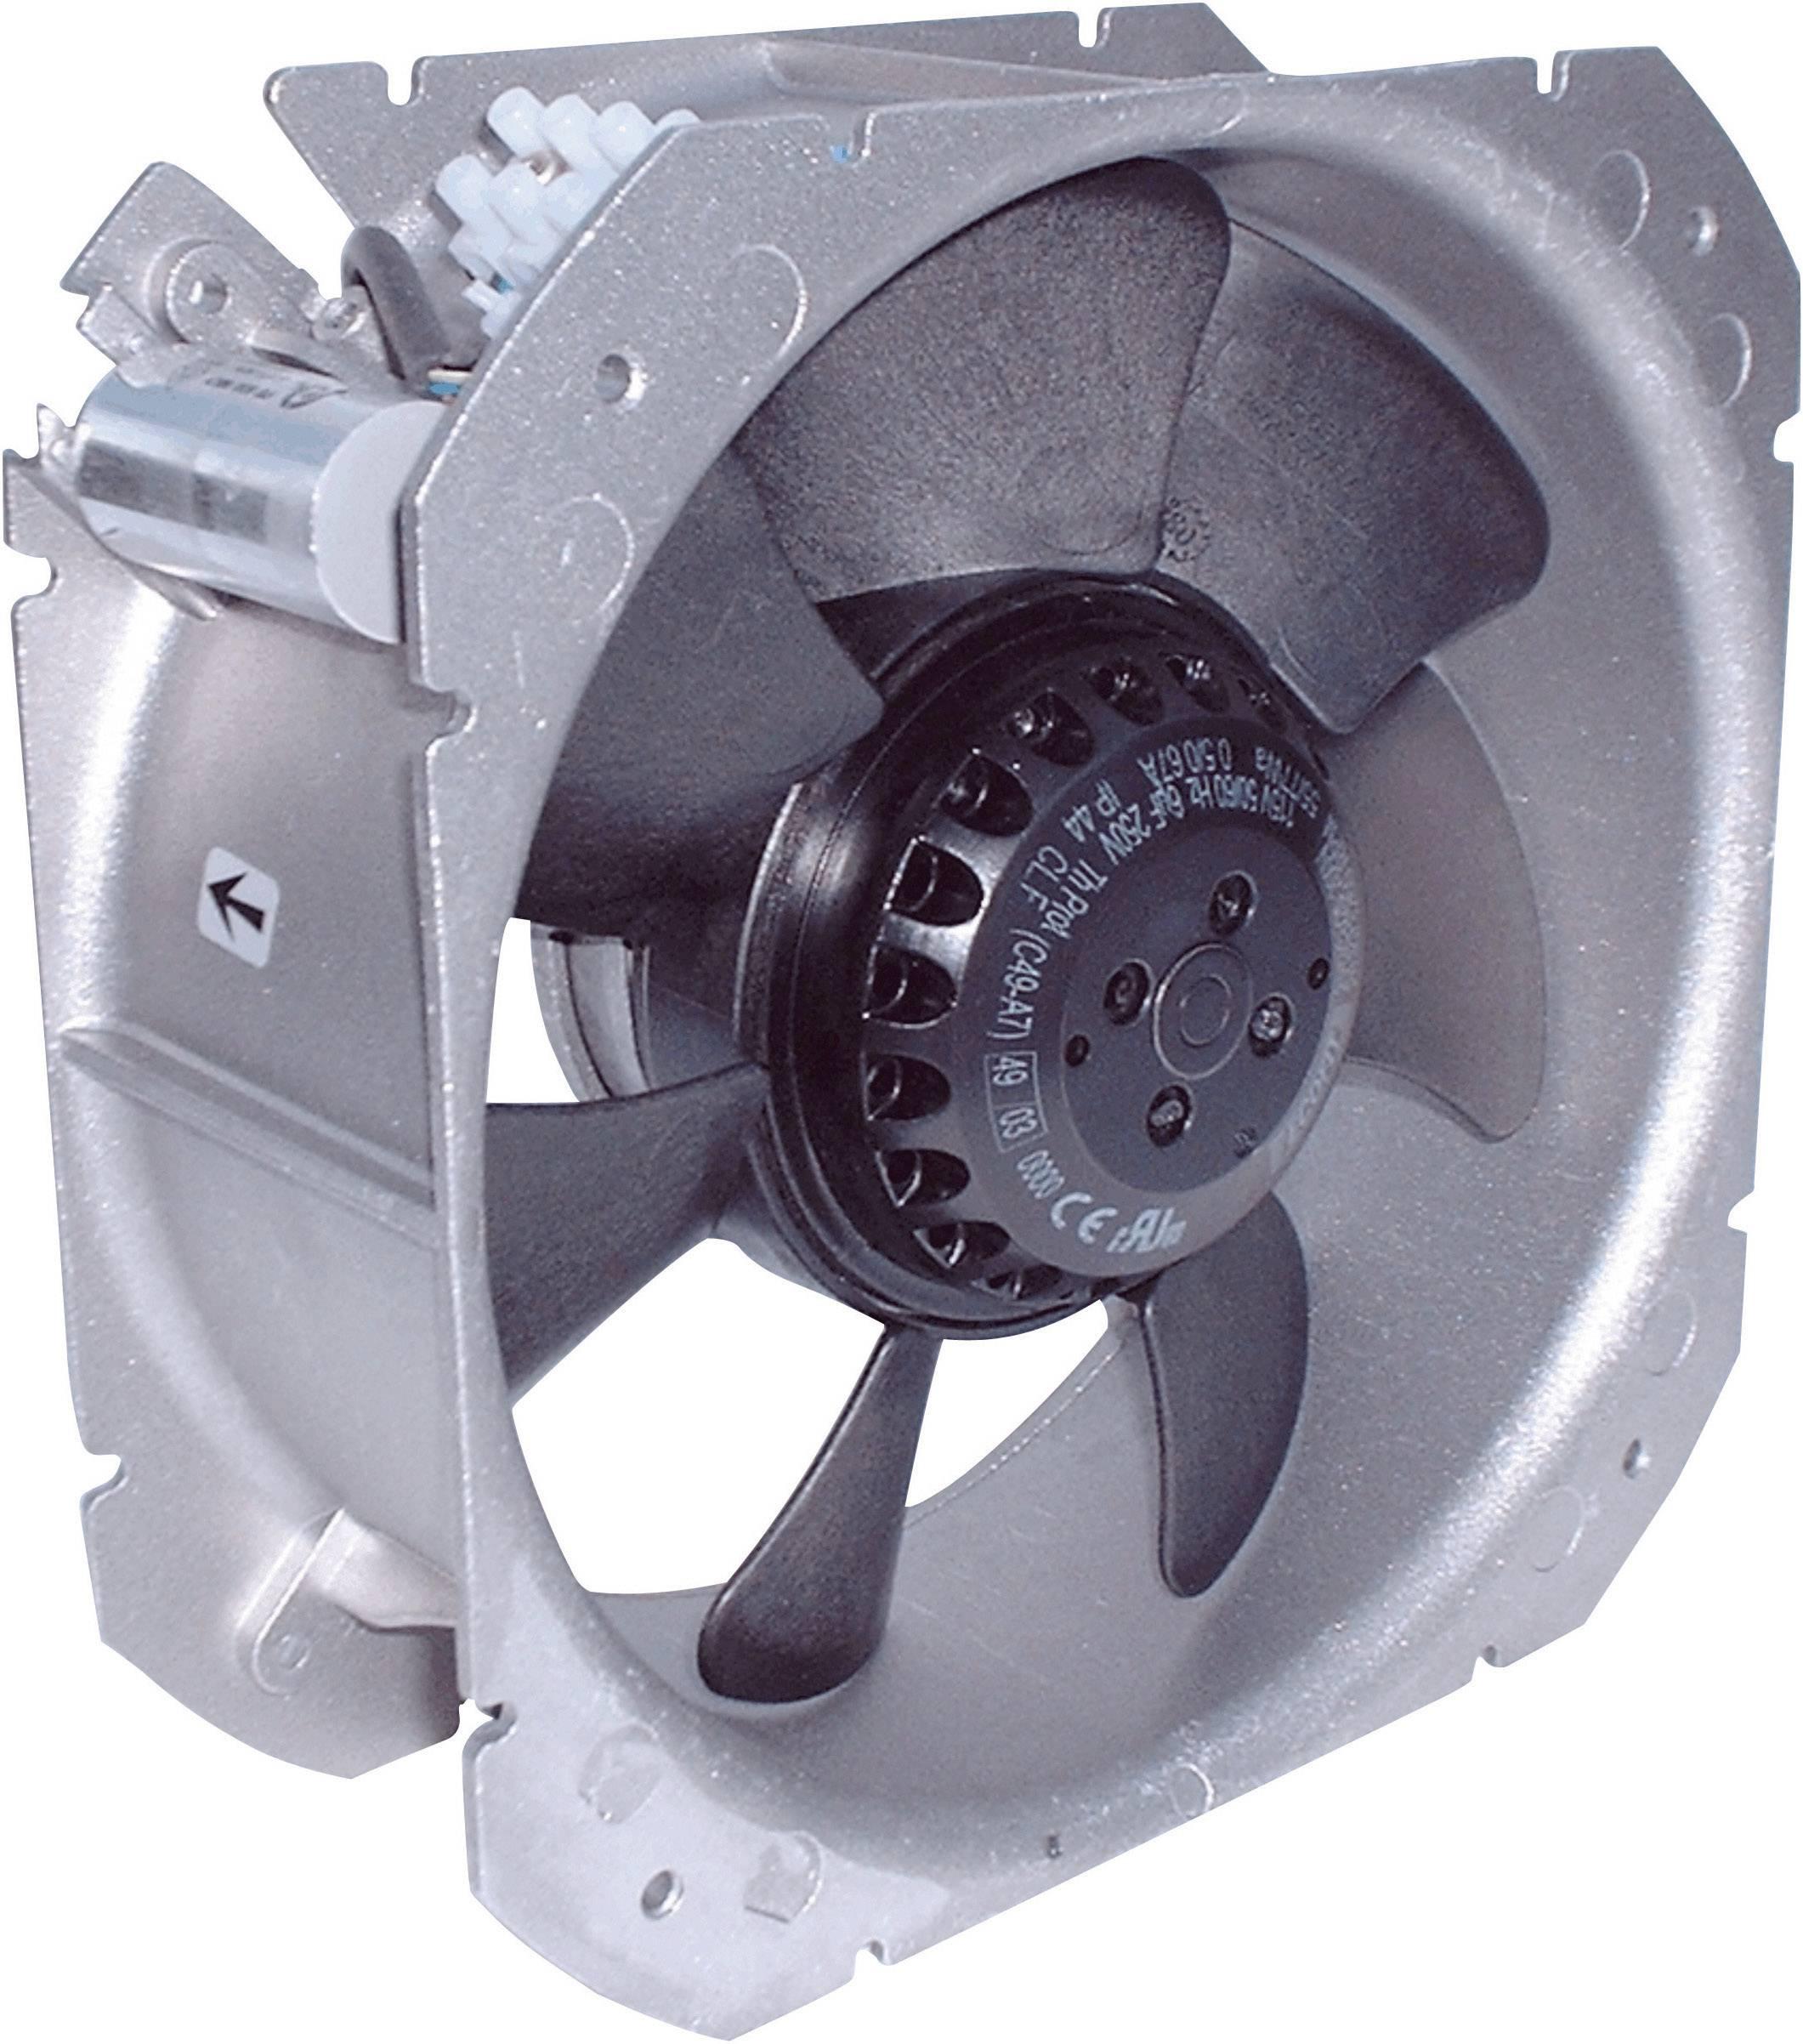 Axiálny ventilátor Ecofit 2VGC25 250V (D27-A0) 2VGC25 250V (D27-A0), 230 V/AC, 67 dB (A), (d x š x v) 280 x 280 x 80 mm